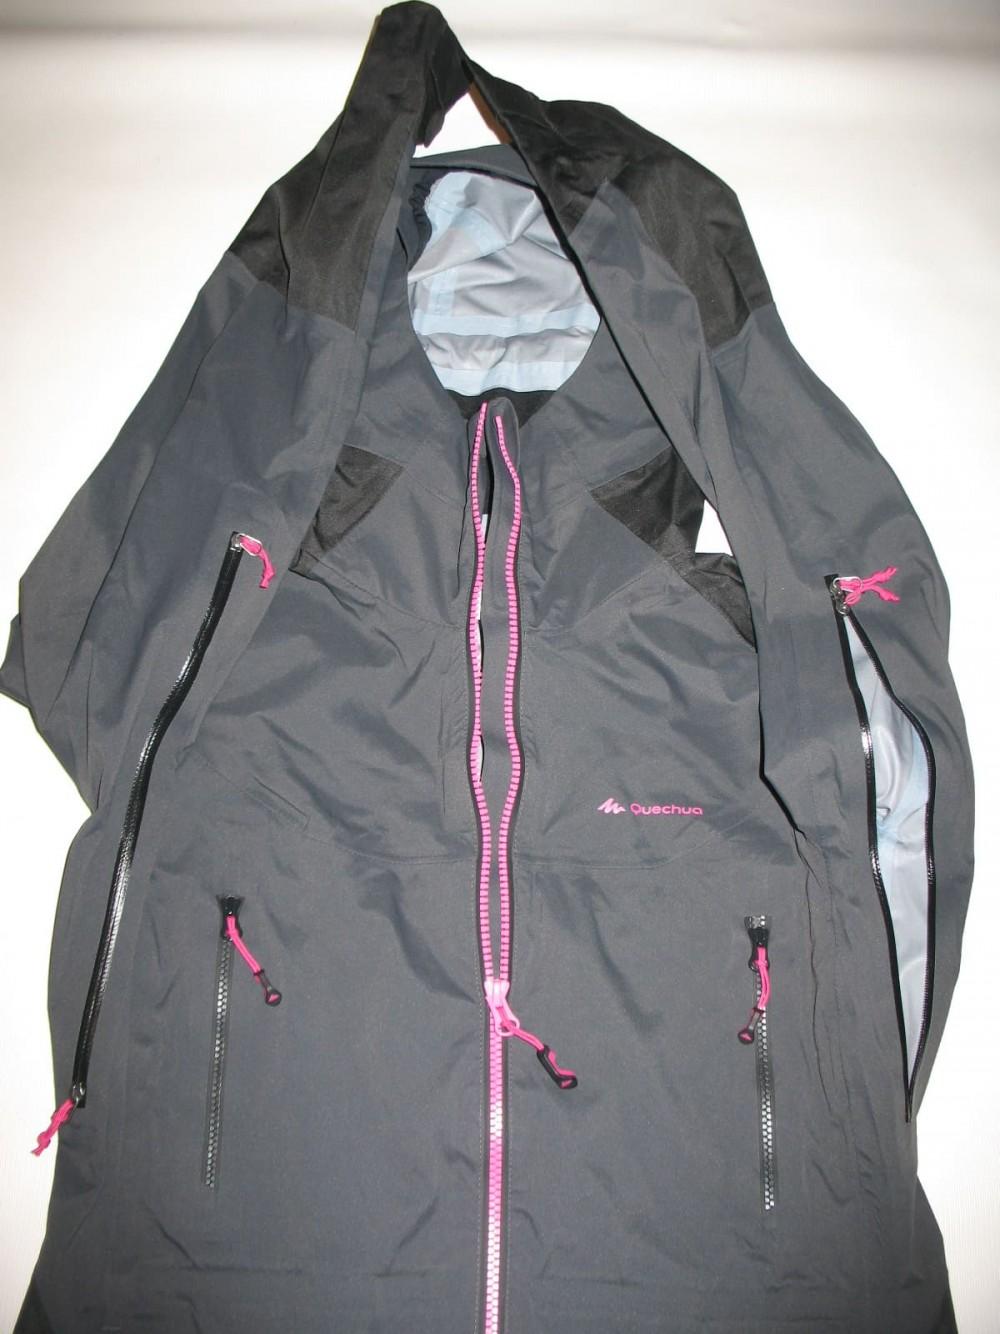 Куртка QUECHUA forclaz 900 l jacket lady (размер XS/S) - 11